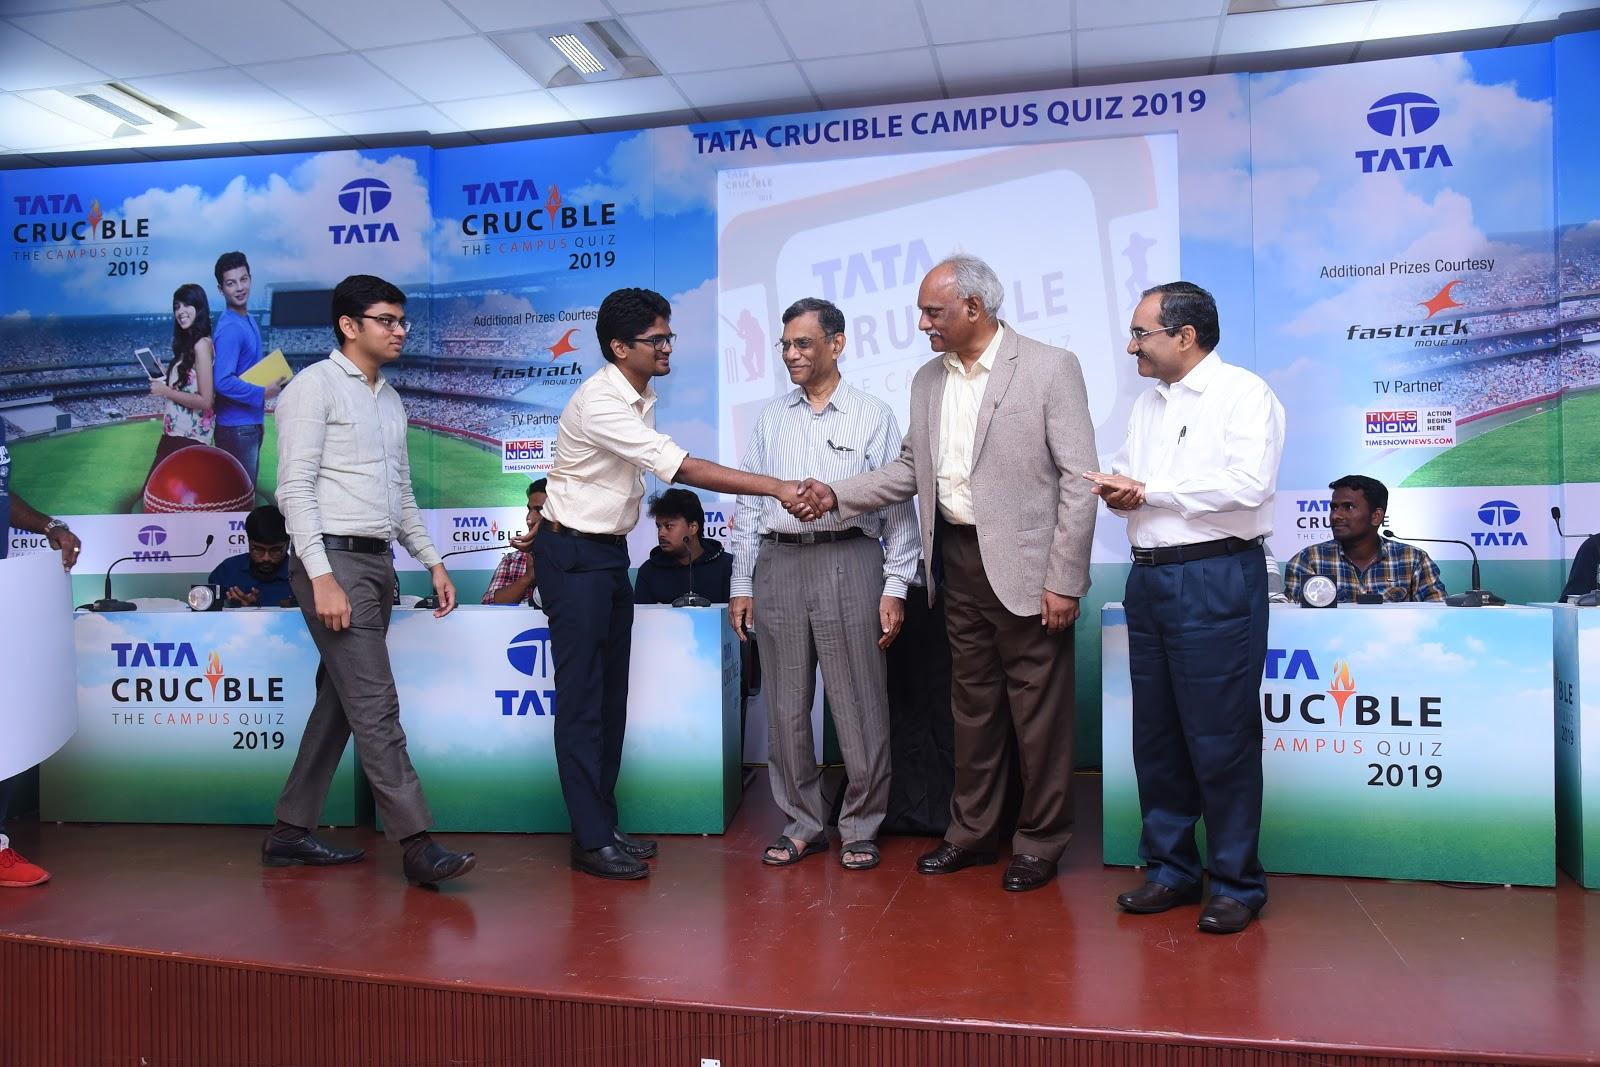 GIM Gallery: Tata Crucible Business Quiz 2019 Winners